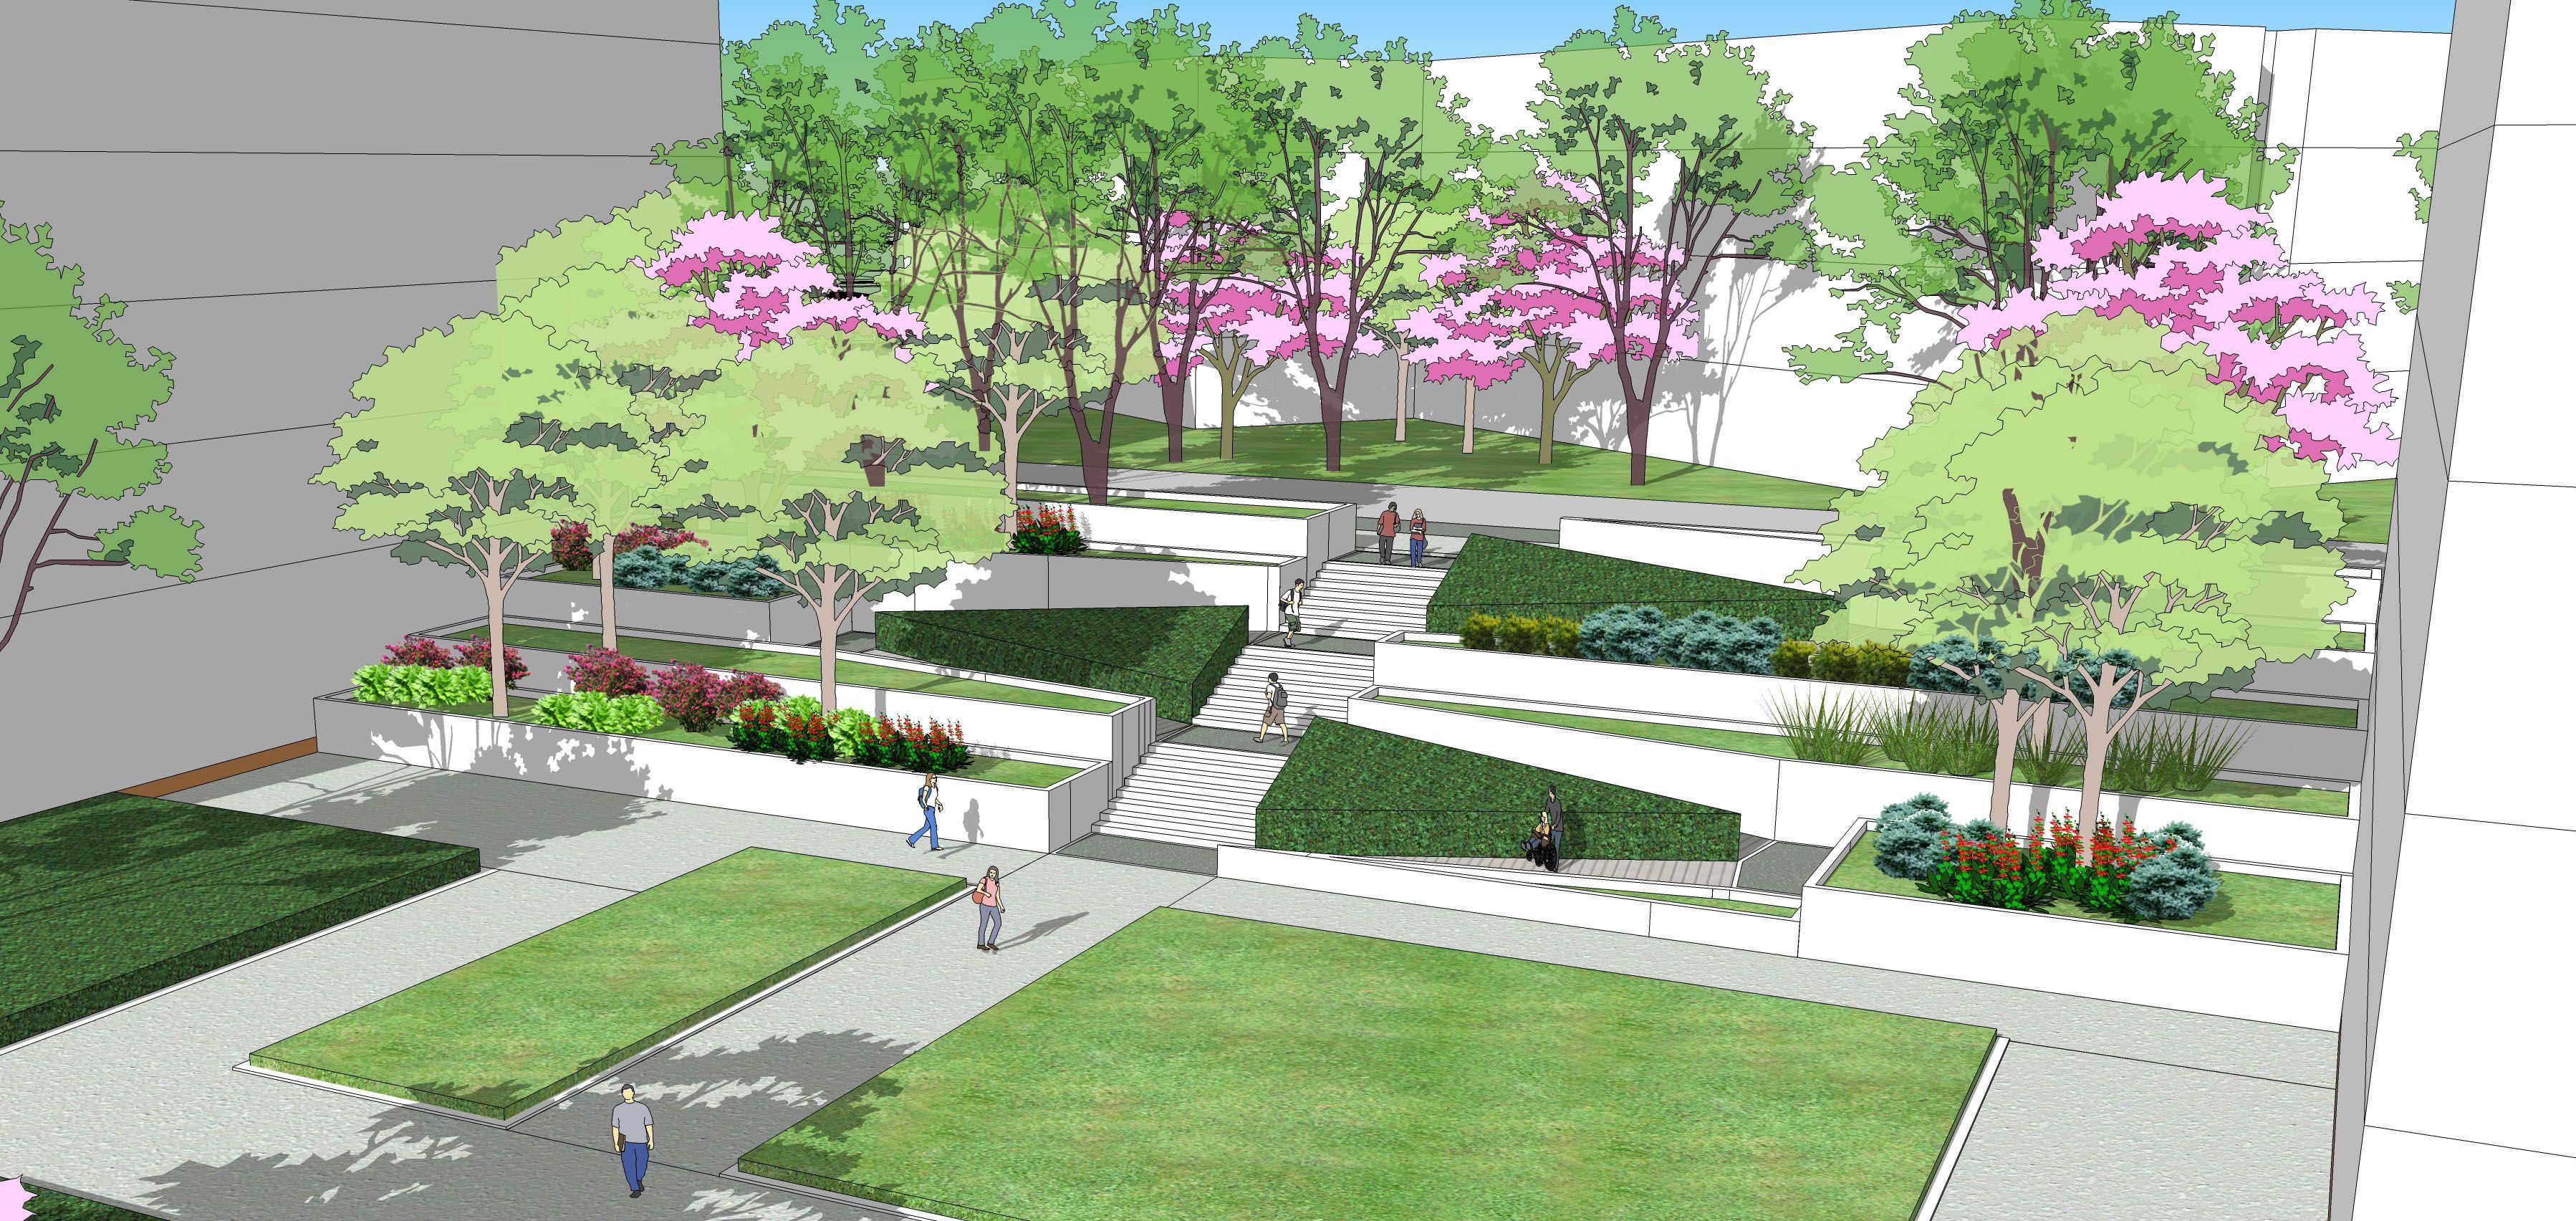 Landscape Design Perspective University Park Modern Landscape Ramp Design Landscape Corridor And Entryway Ga Landscape Model Ramp Design Landscape Design